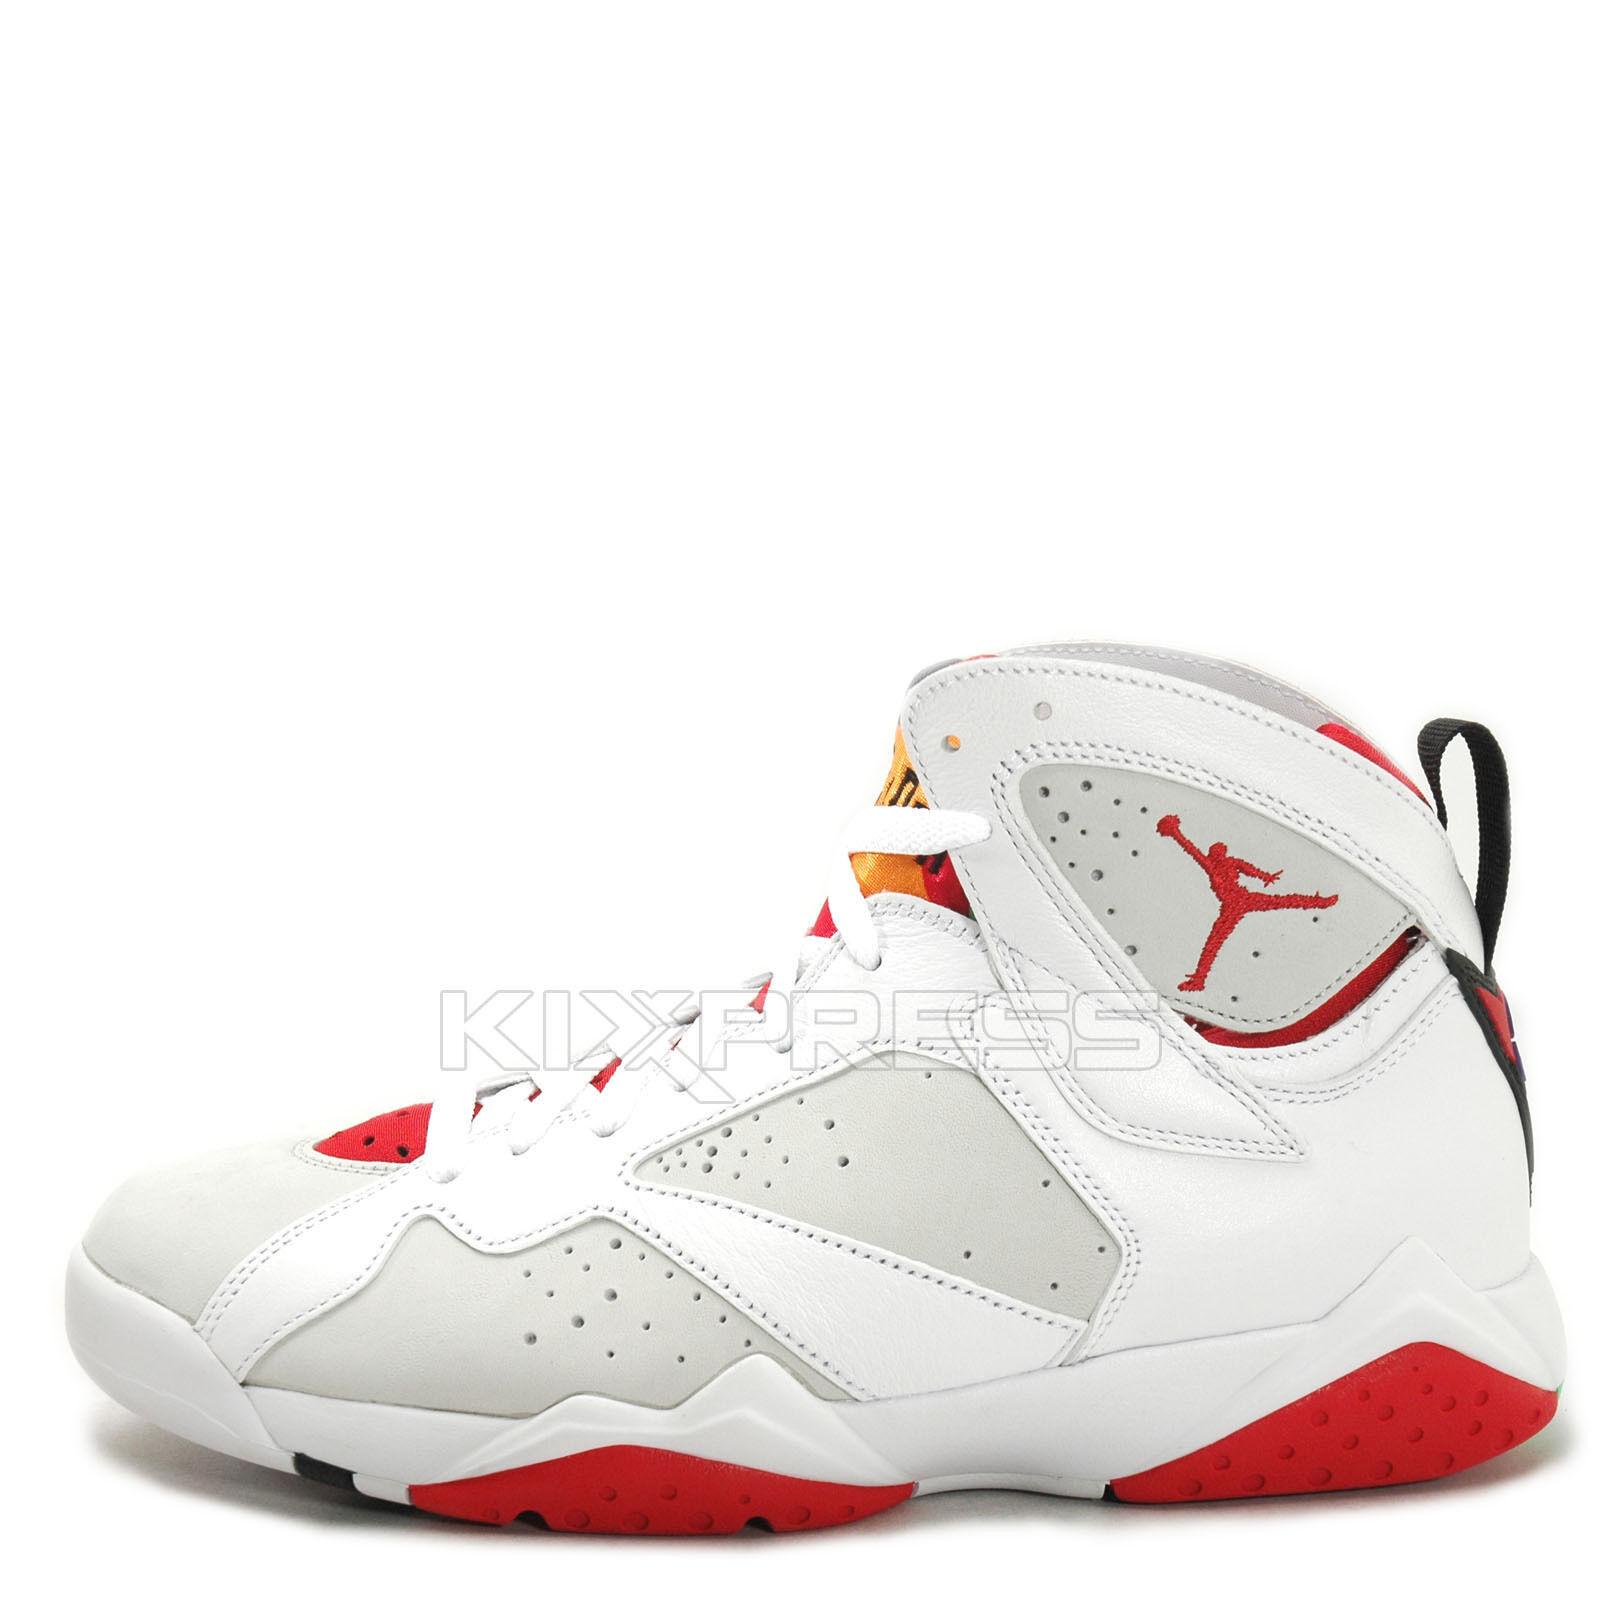 Nike Air Jordan 7 Retro [304775-125] Basketball Hare Bugs Bunny White/Red